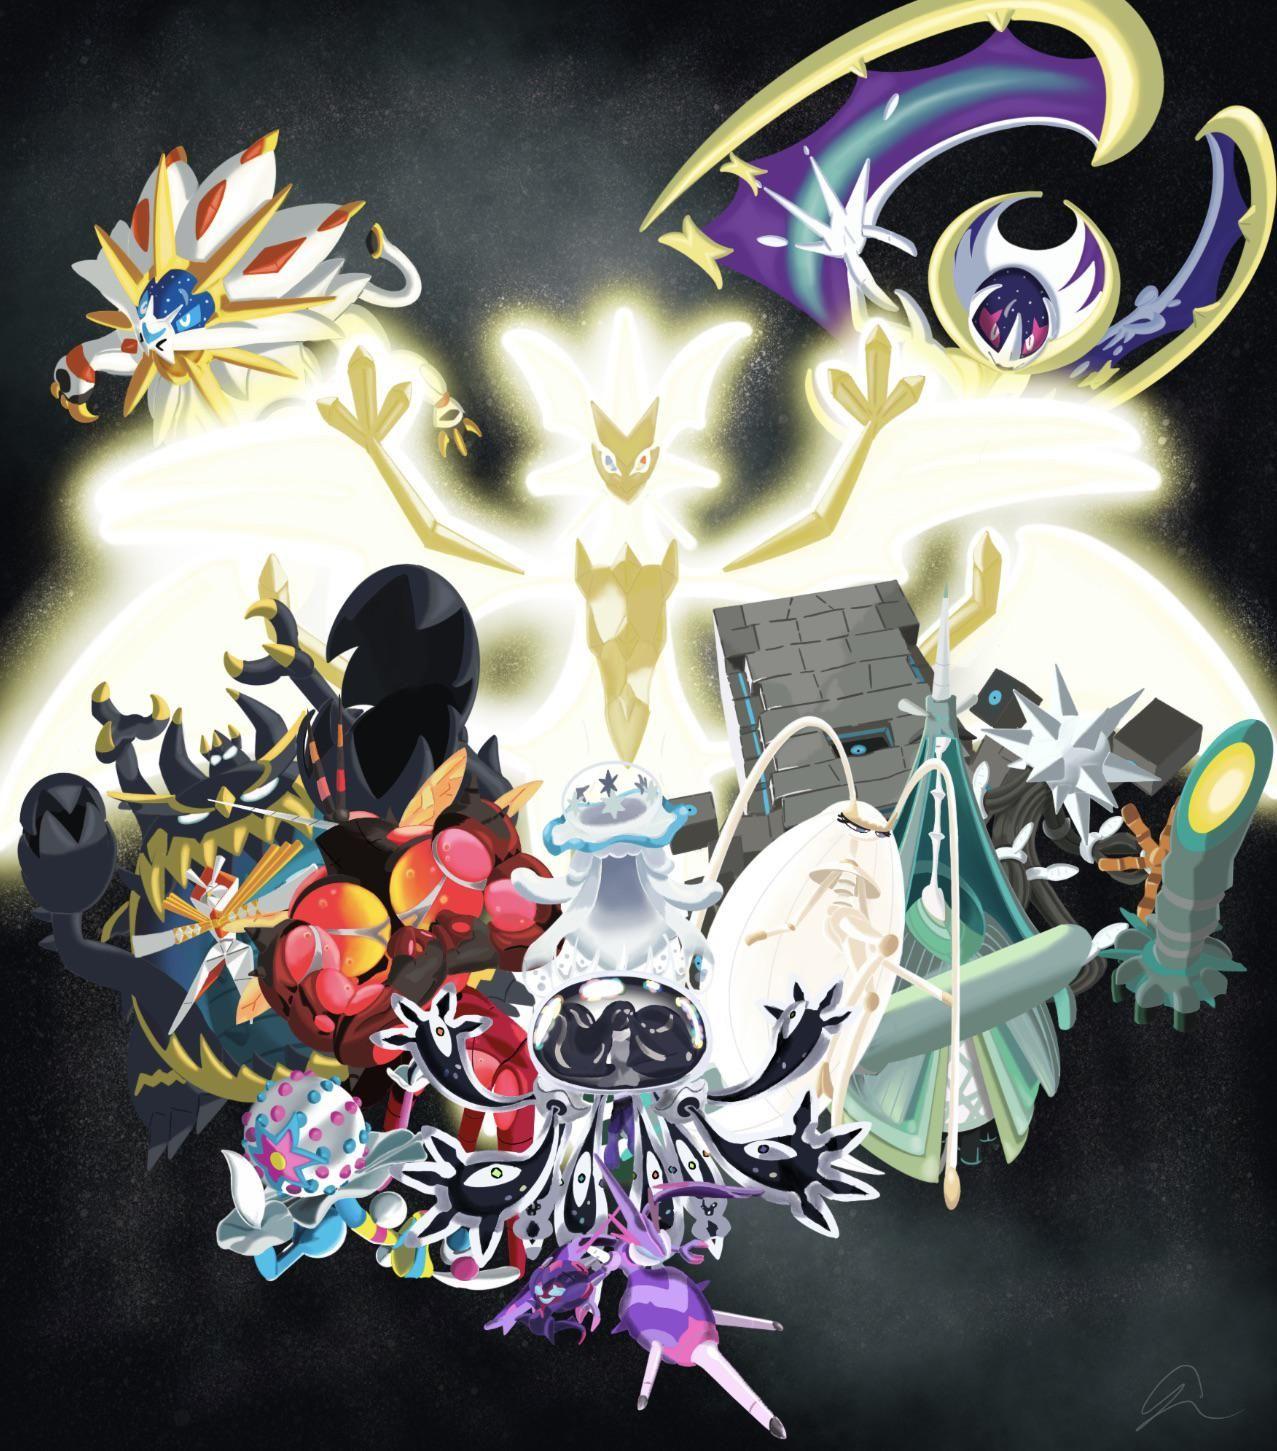 My Attempt At Drawing The Aliens Ultra Necrozma Ultra Beasts Solgaleo Lunala Https I Redd It G4wtf9c6gm531 Jpg Pokemon Eeveelutions Pokemon Pokemon Poster